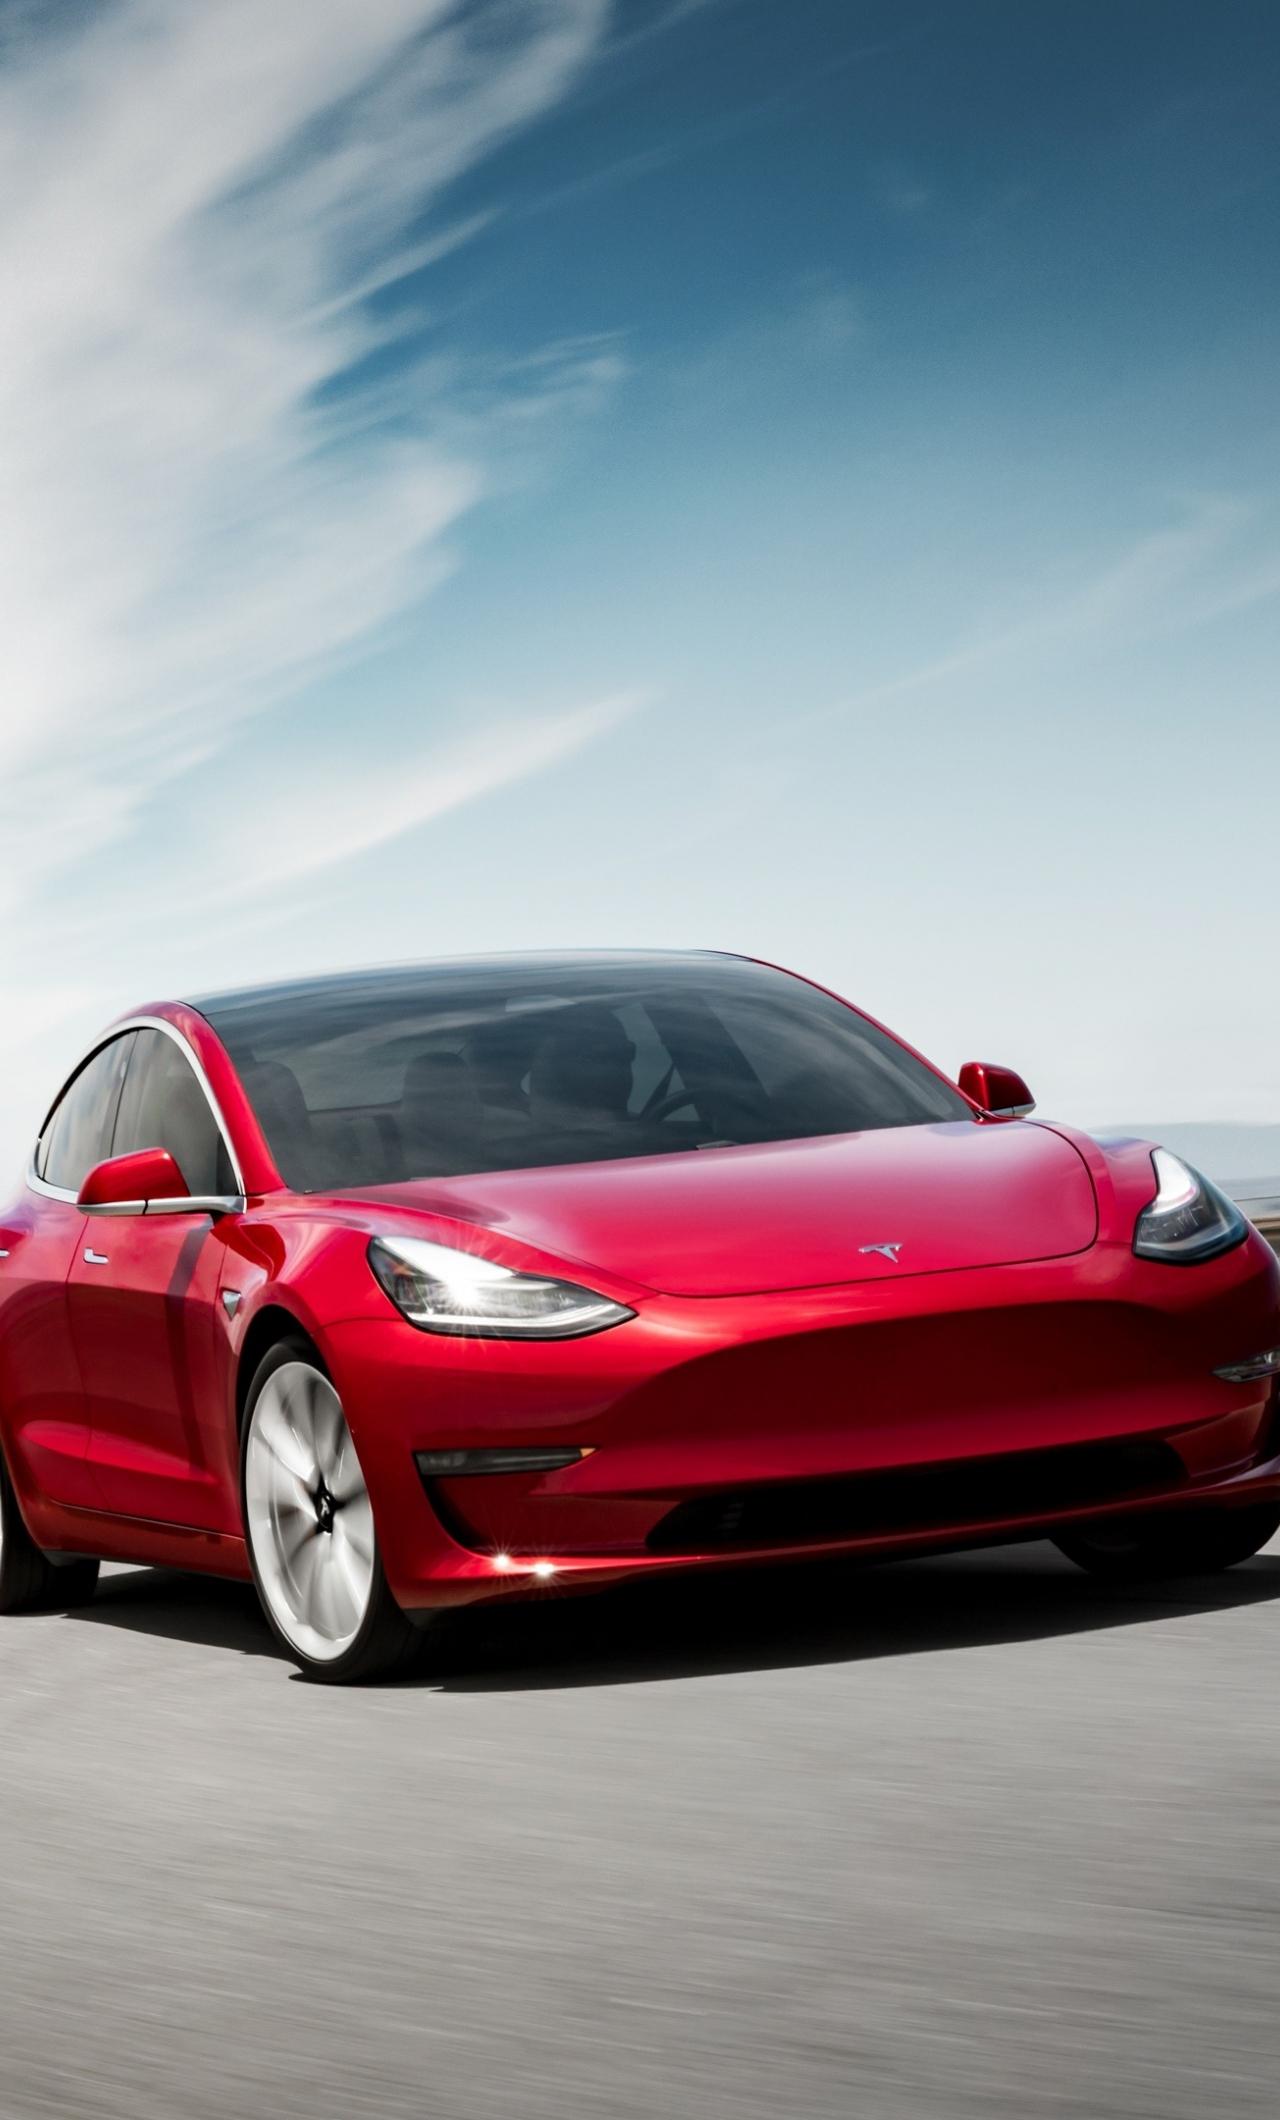 Download 1280x2120 Wallpaper Tesla Model 3 On Road Red Iphone 6